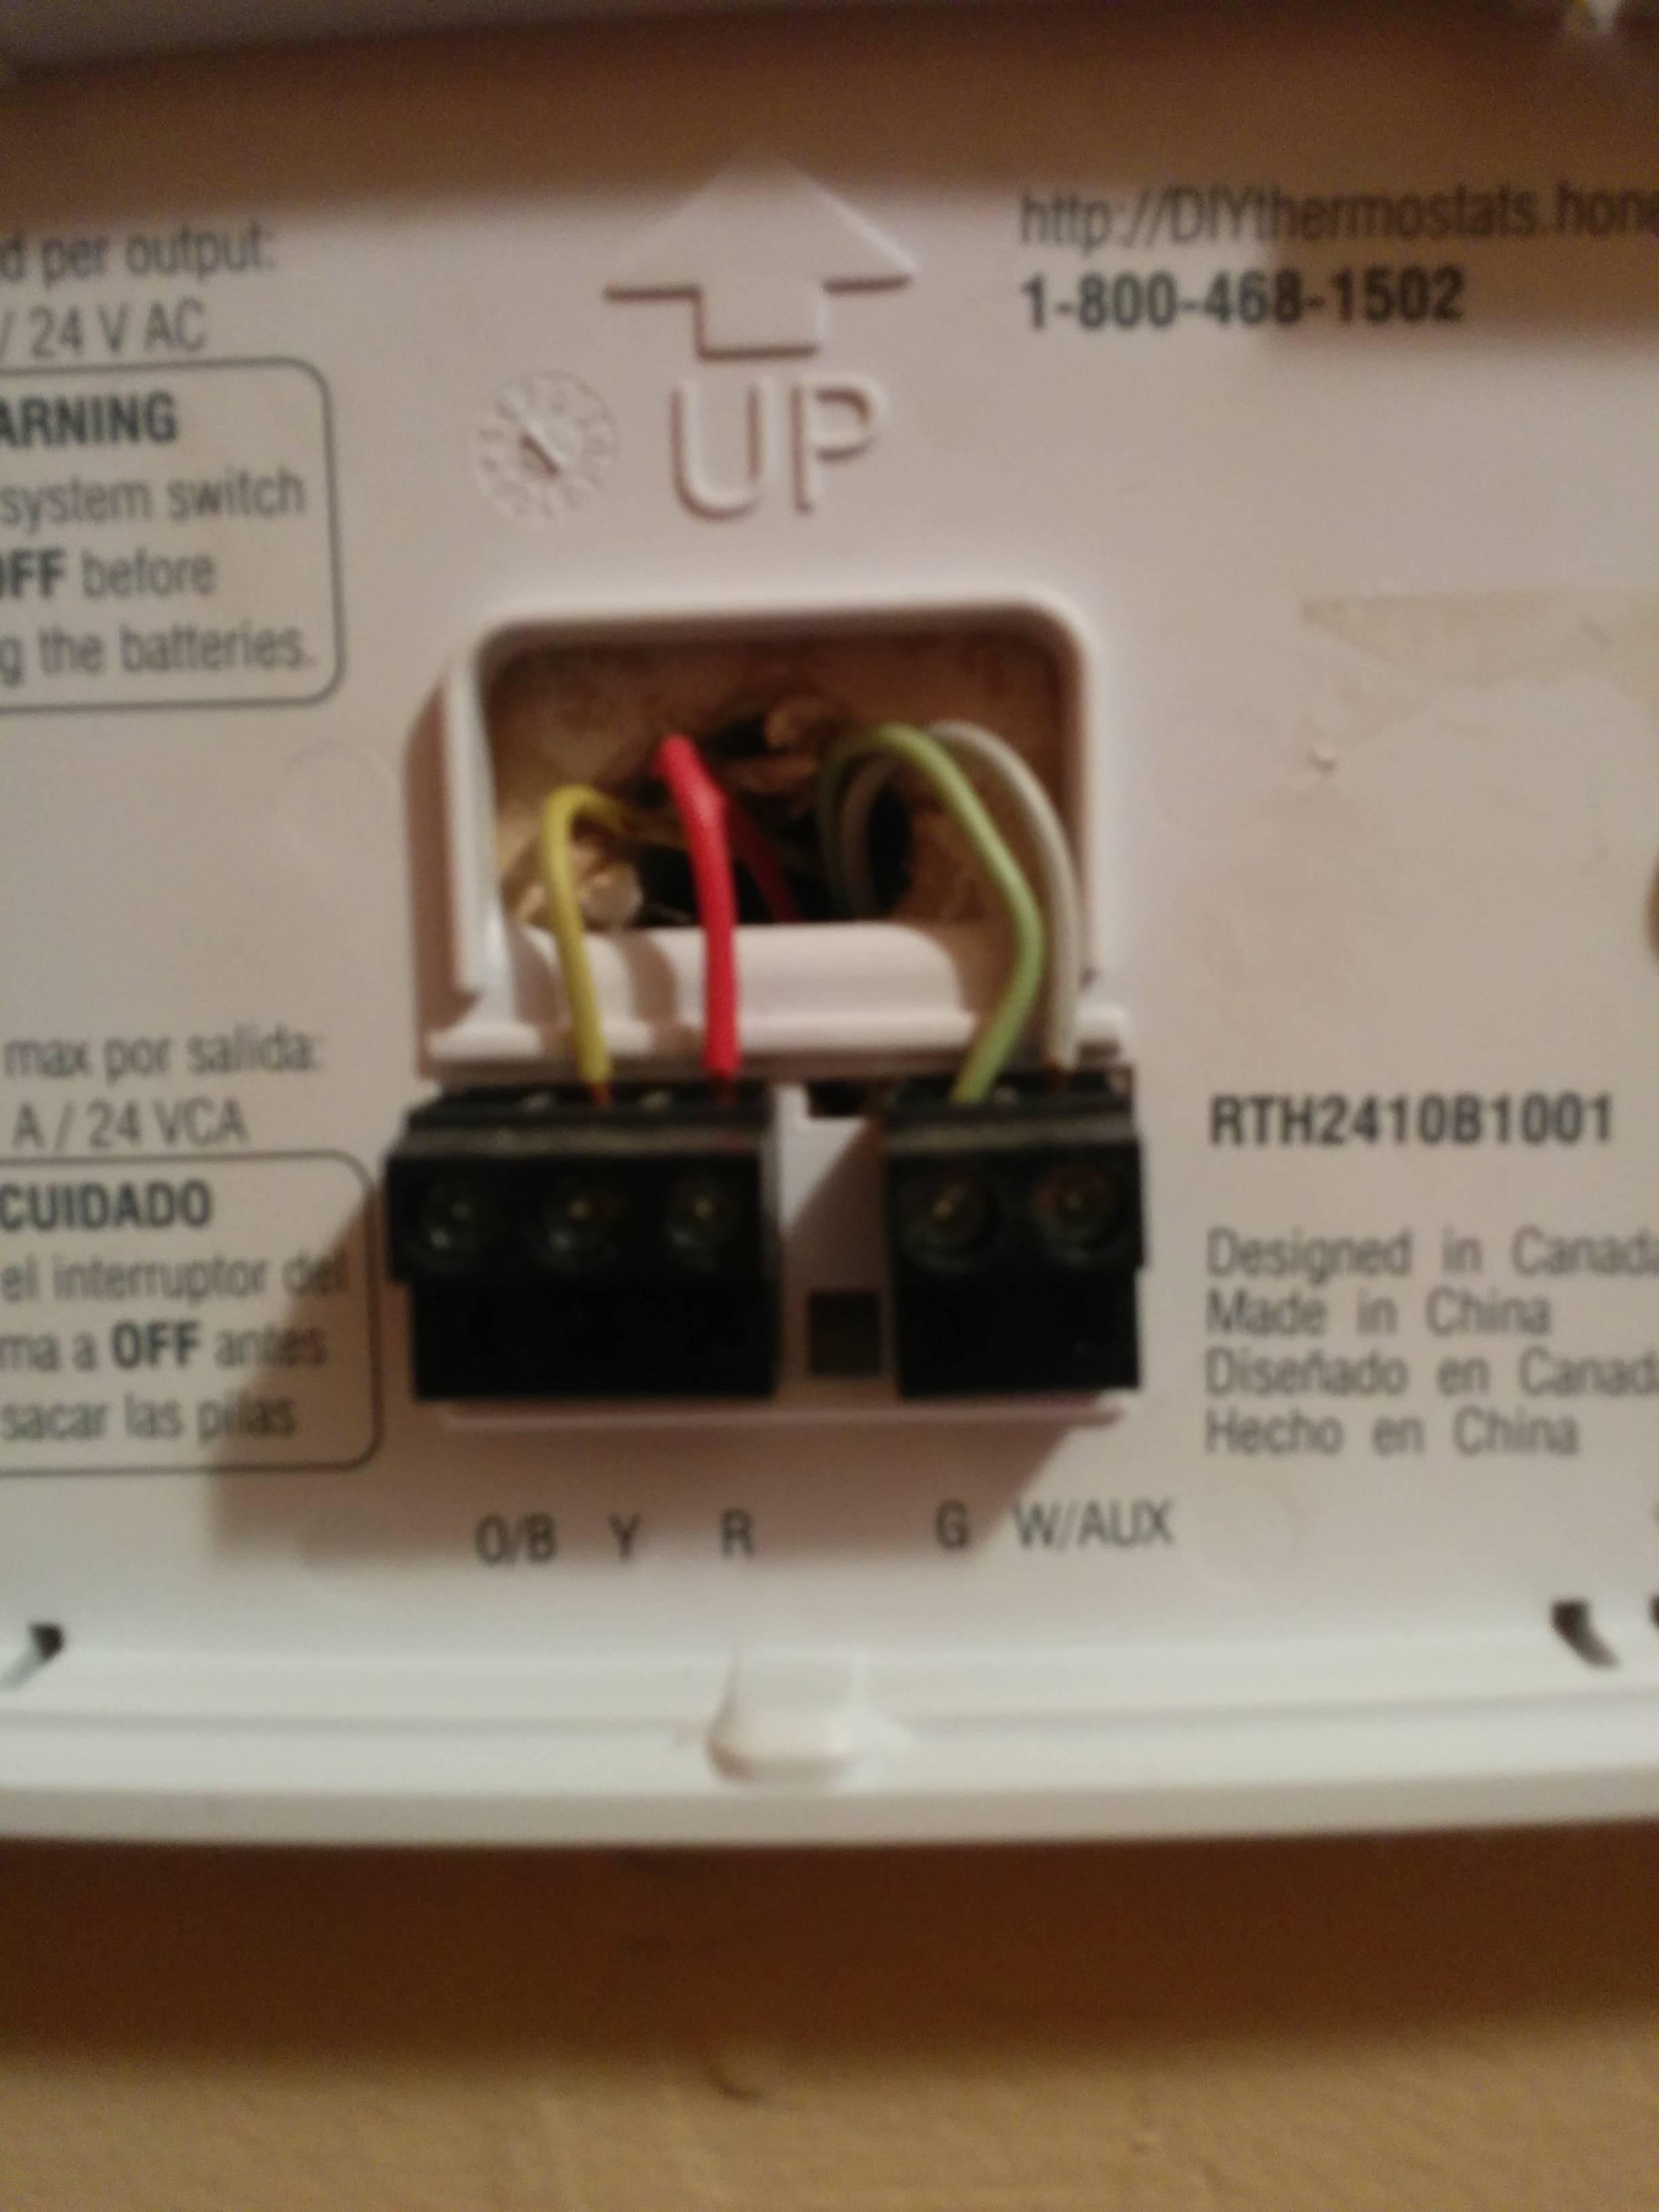 2 Wire Honeywell thermostat Installation Ecobee3 Installation thermostat Y Terminal Yellow Wire Of 2 Wire Honeywell thermostat Installation